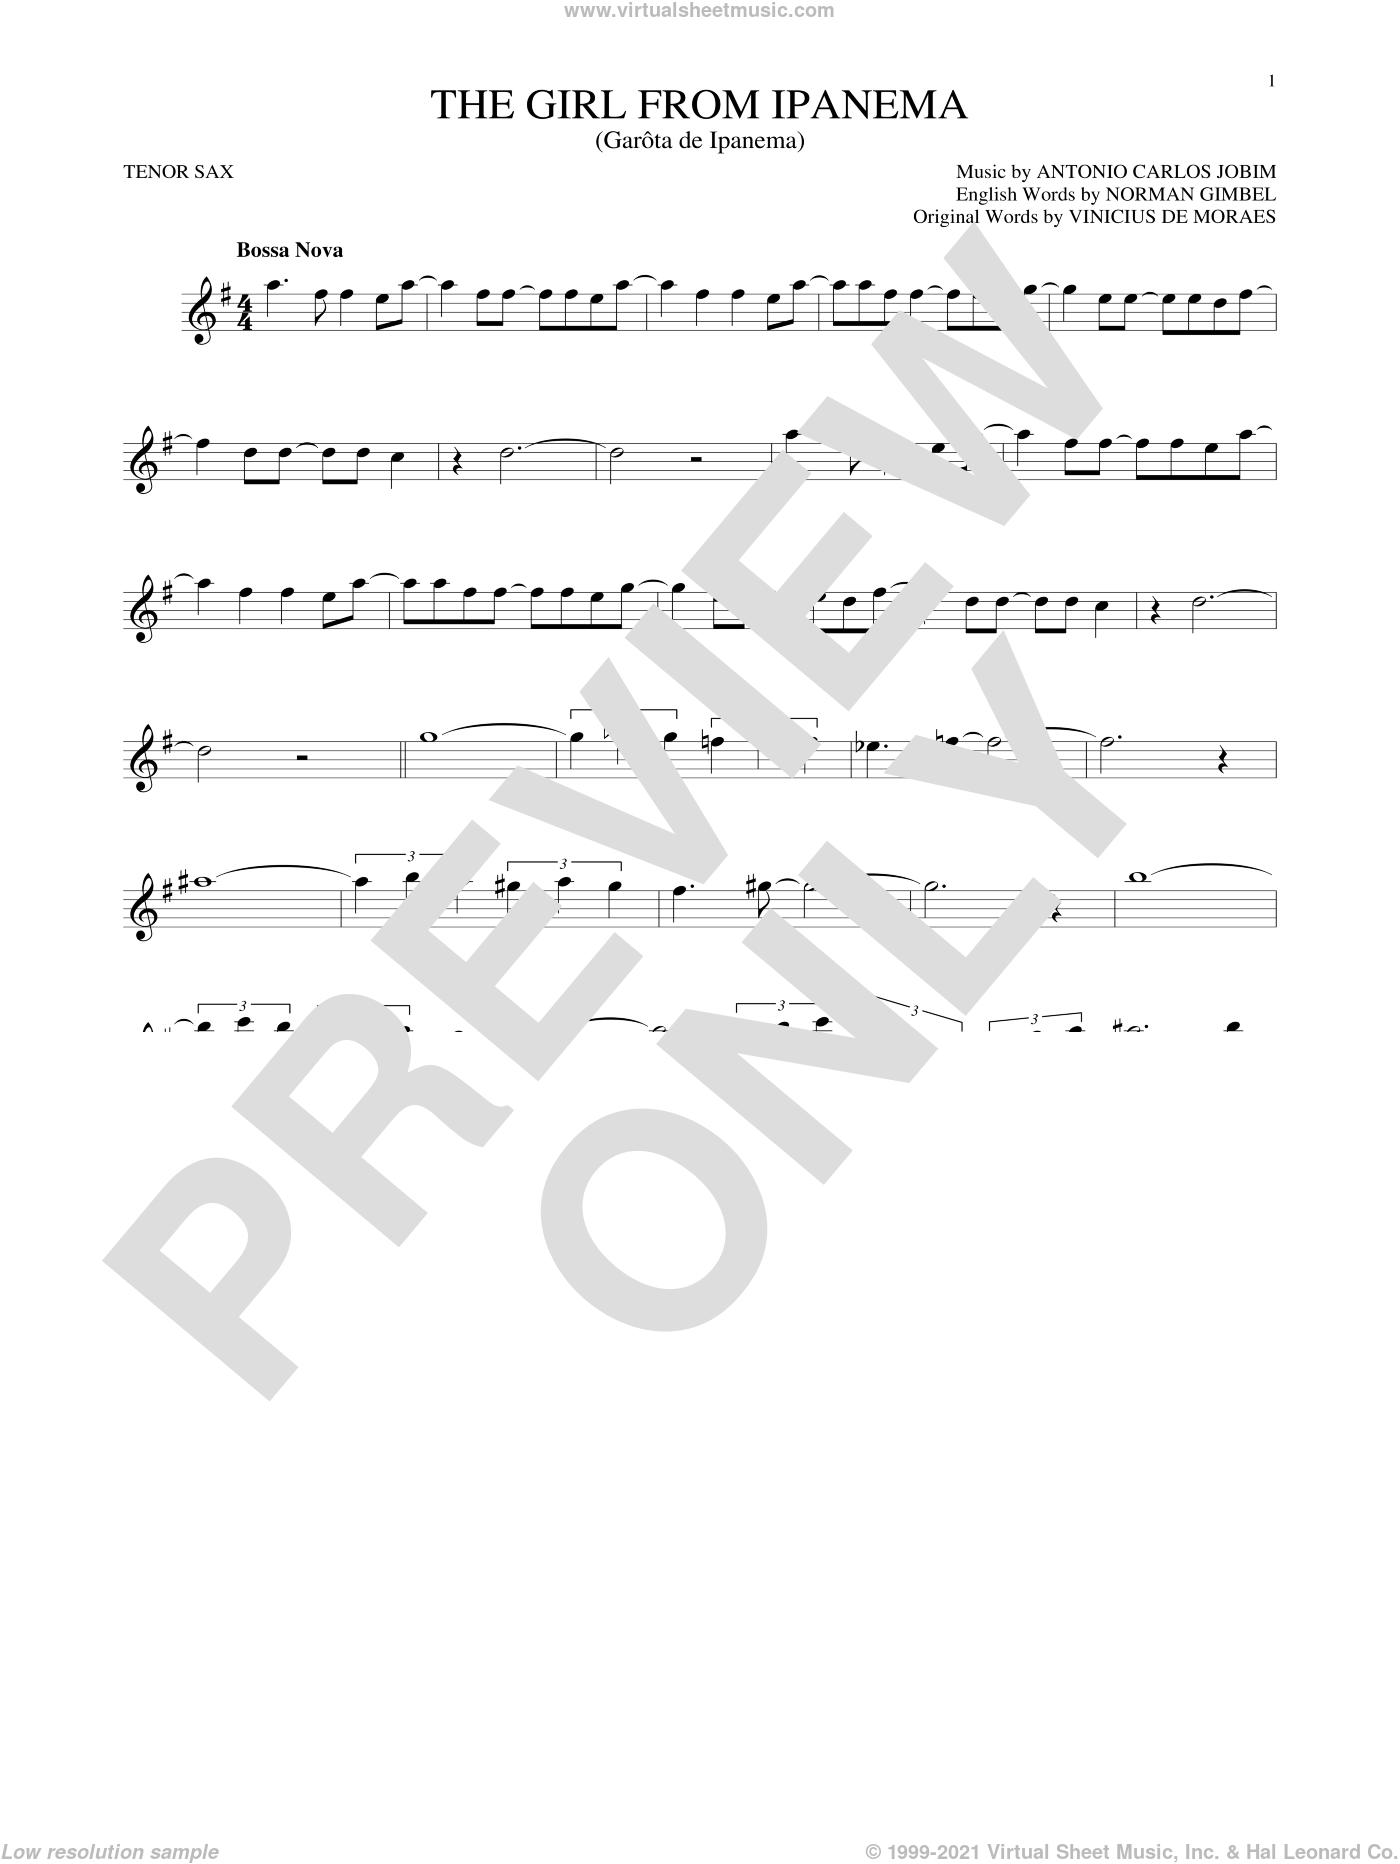 The Girl From Ipanema sheet music for tenor saxophone solo by Norman Gimbel, Stan Getz & Astrud Gilberto, Antonio Carlos Jobim and Vinicius de Moraes, intermediate skill level